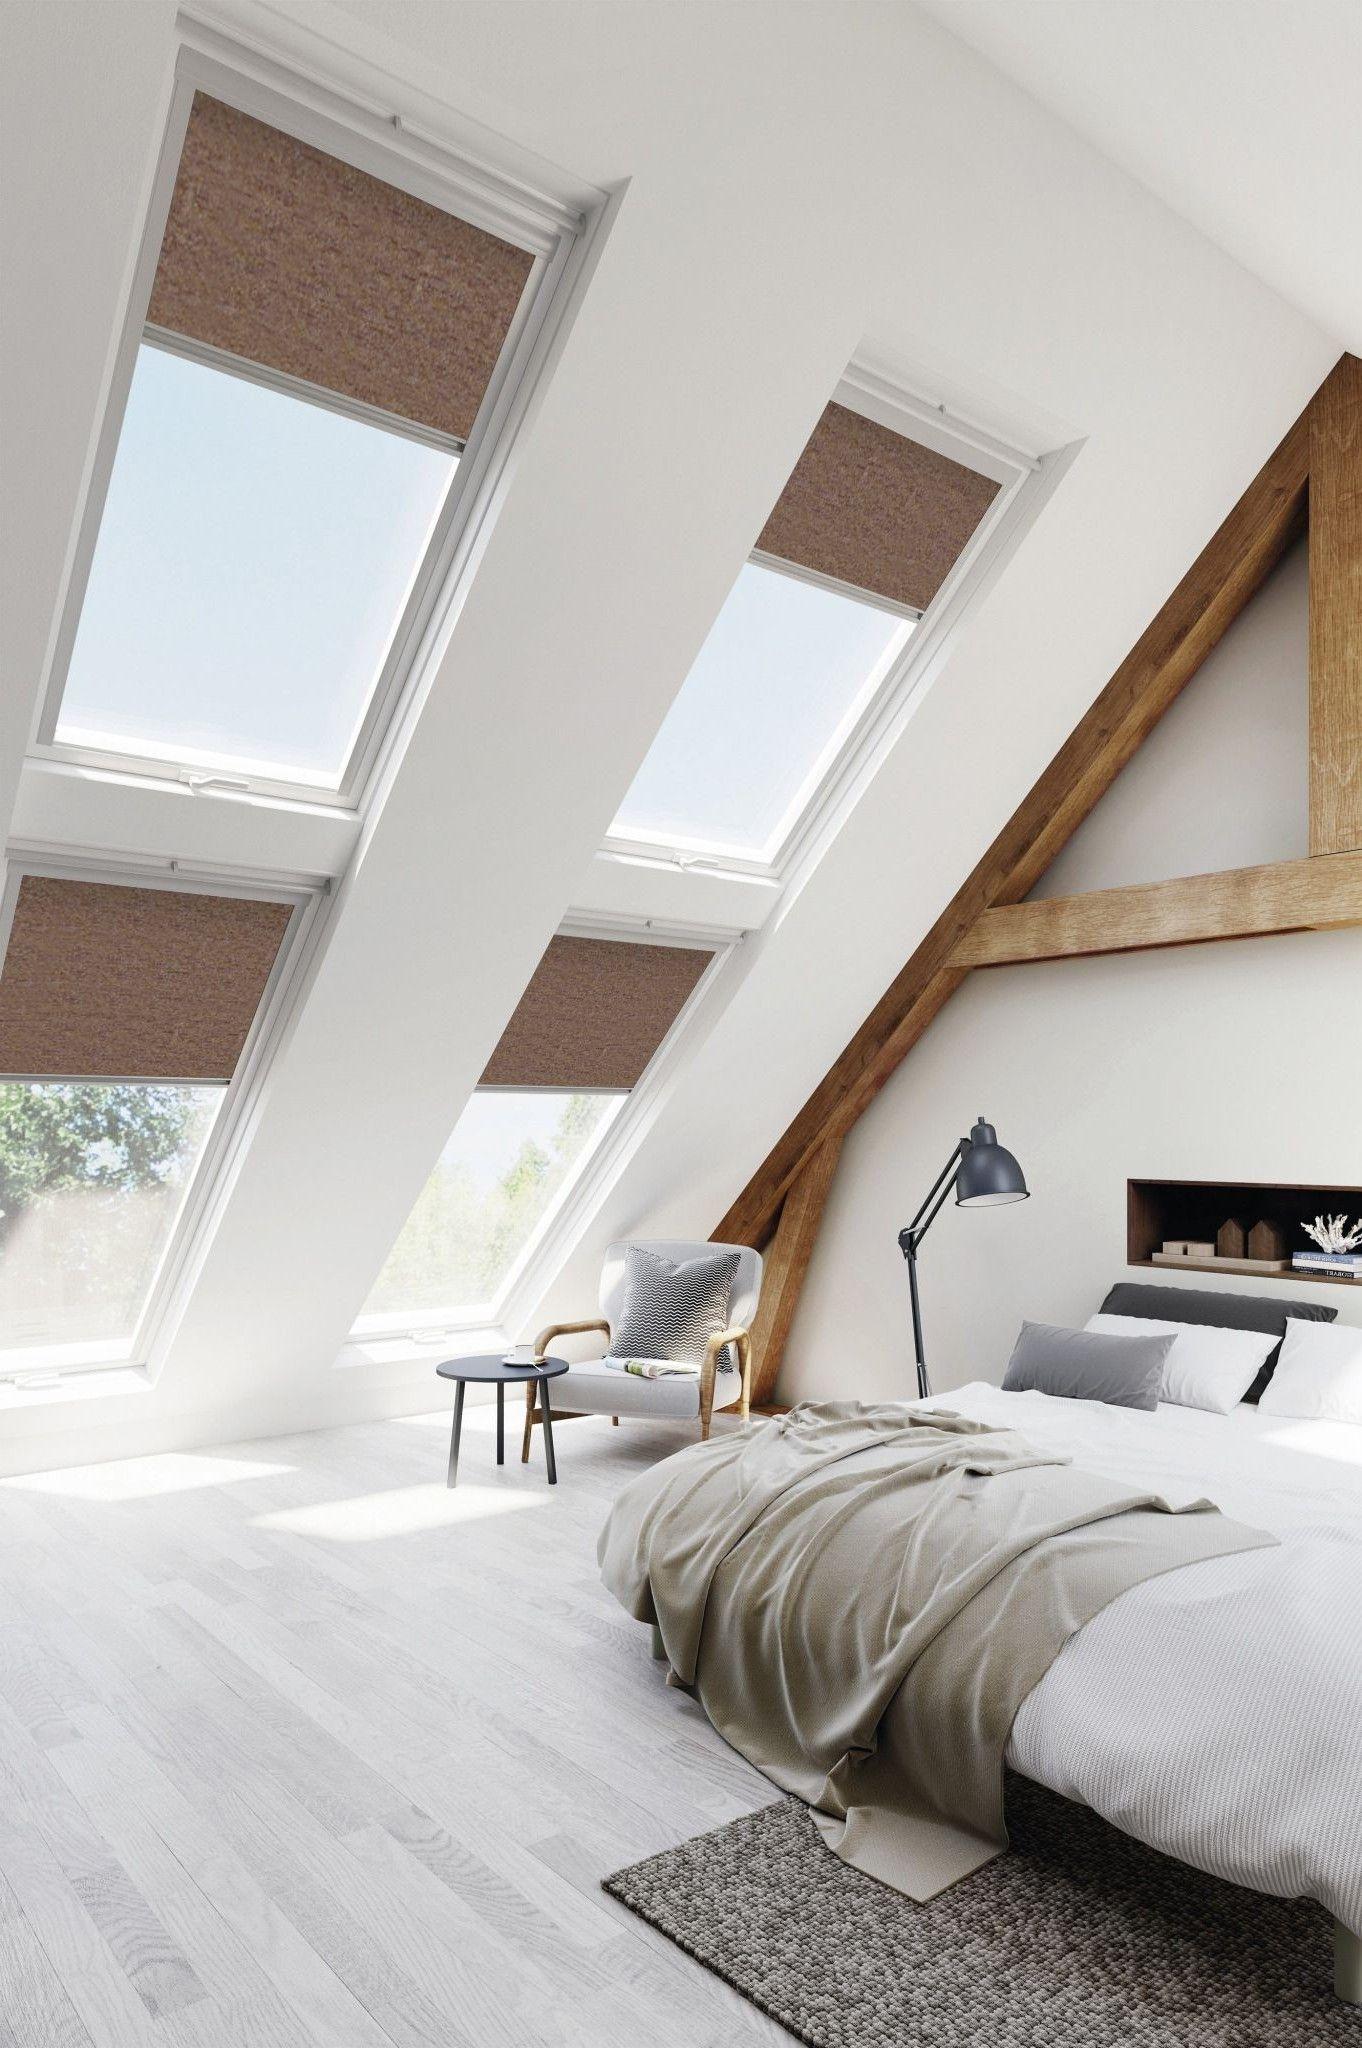 Pin Auf Slaapkamer Met Verhoogd Plafond